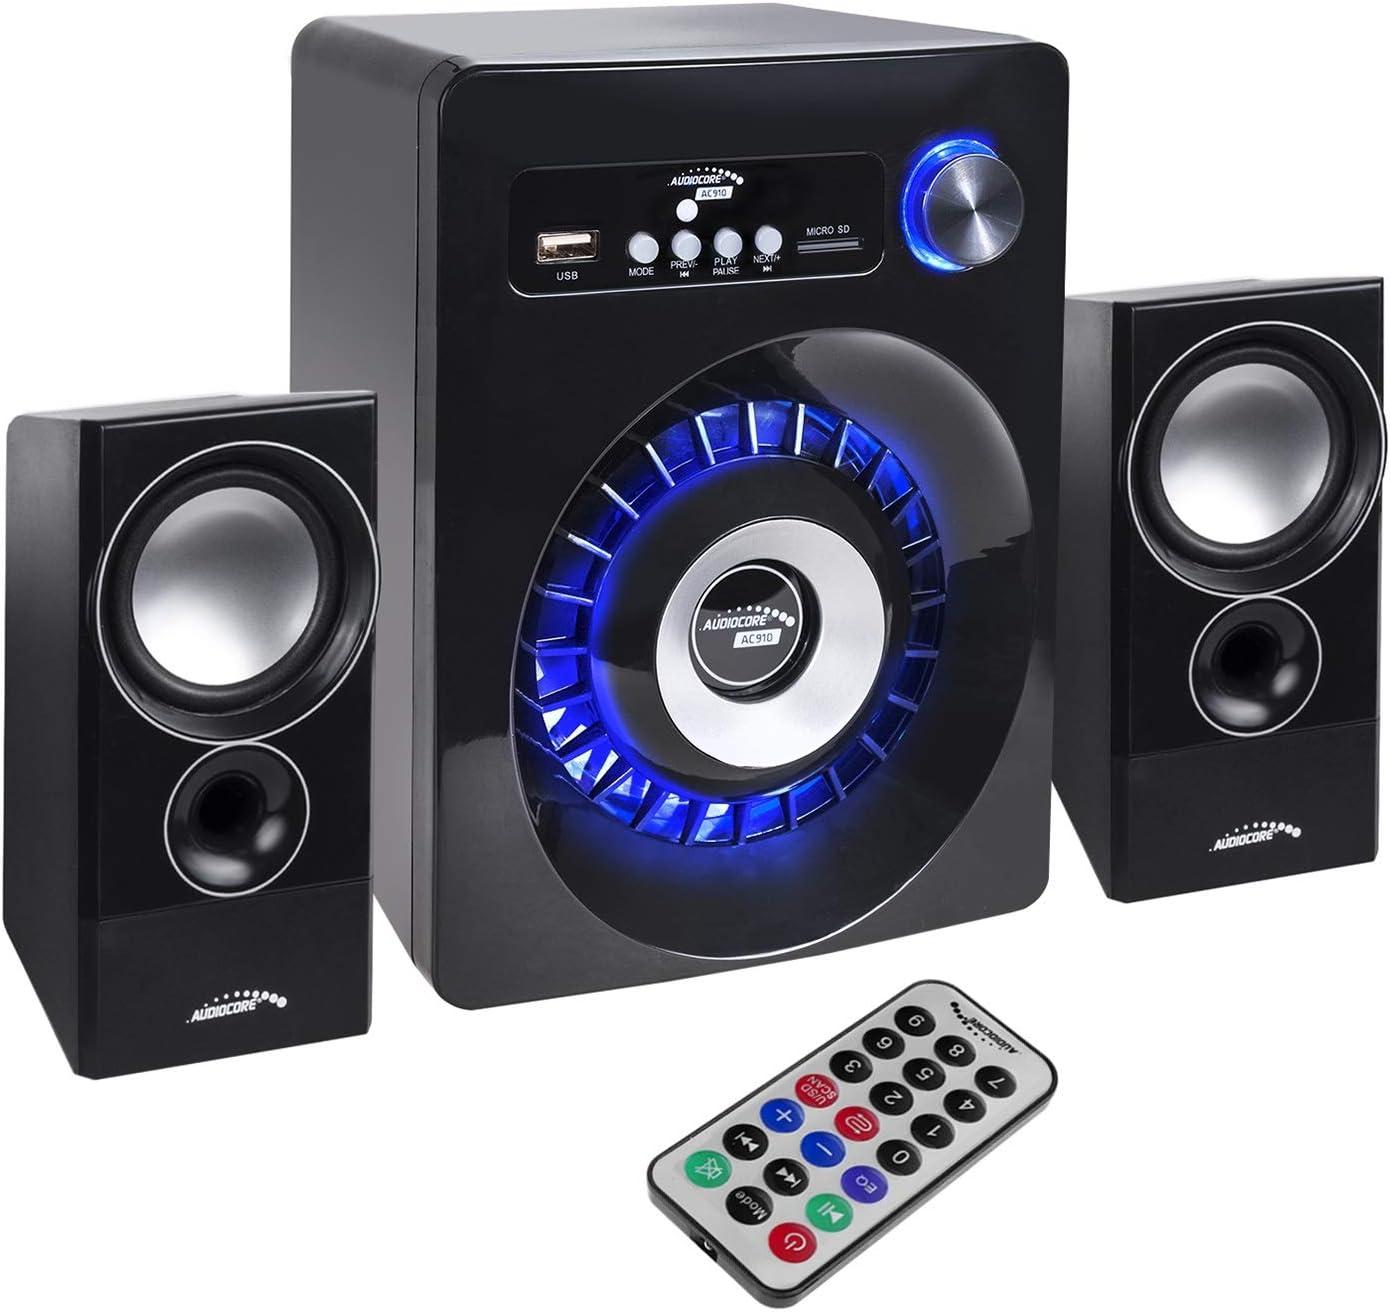 Altavoces portátiles Audiocore AC910 Bluetooth 2.1 Altavoz FM Radio, Entrada de Tarjeta TF, AUX, alimentación USB